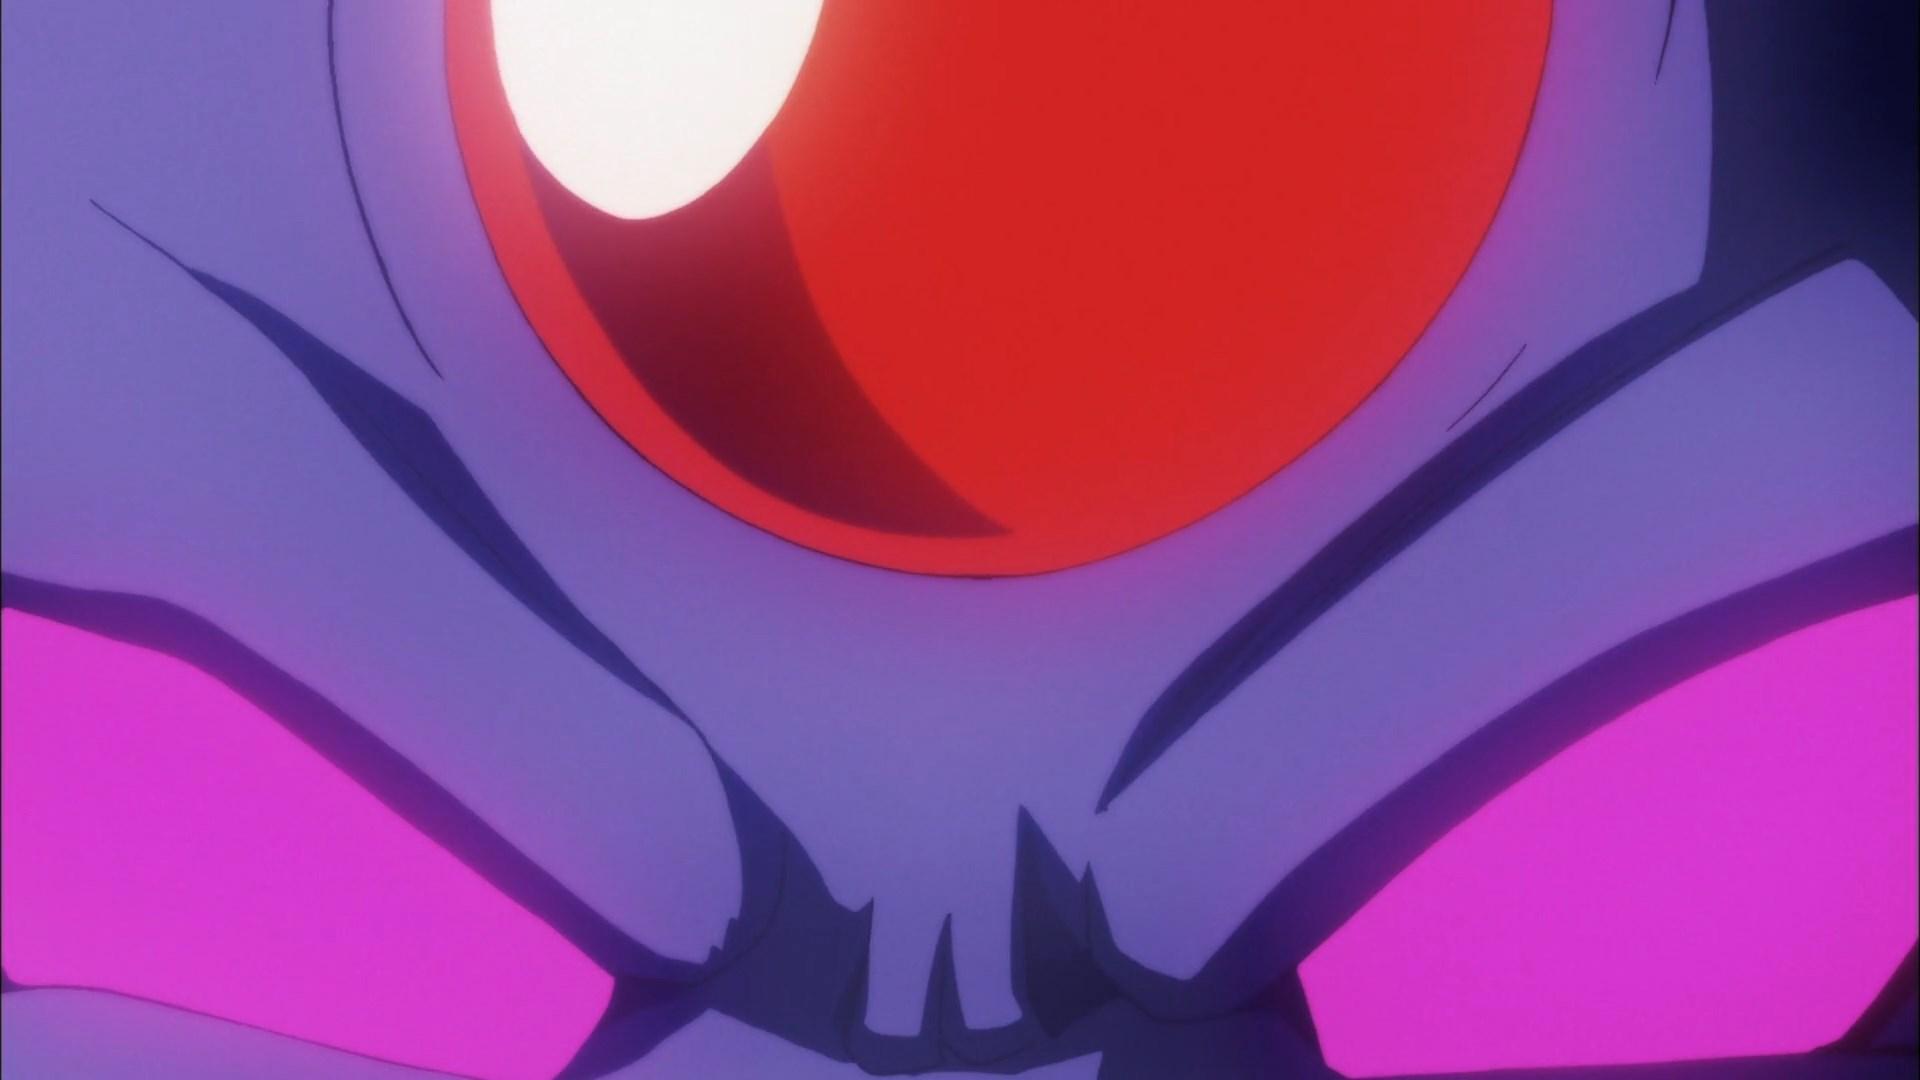 [HorribleSubs] Dragon Ball Super - 121 [1080p].mkv_snapshot_04.58